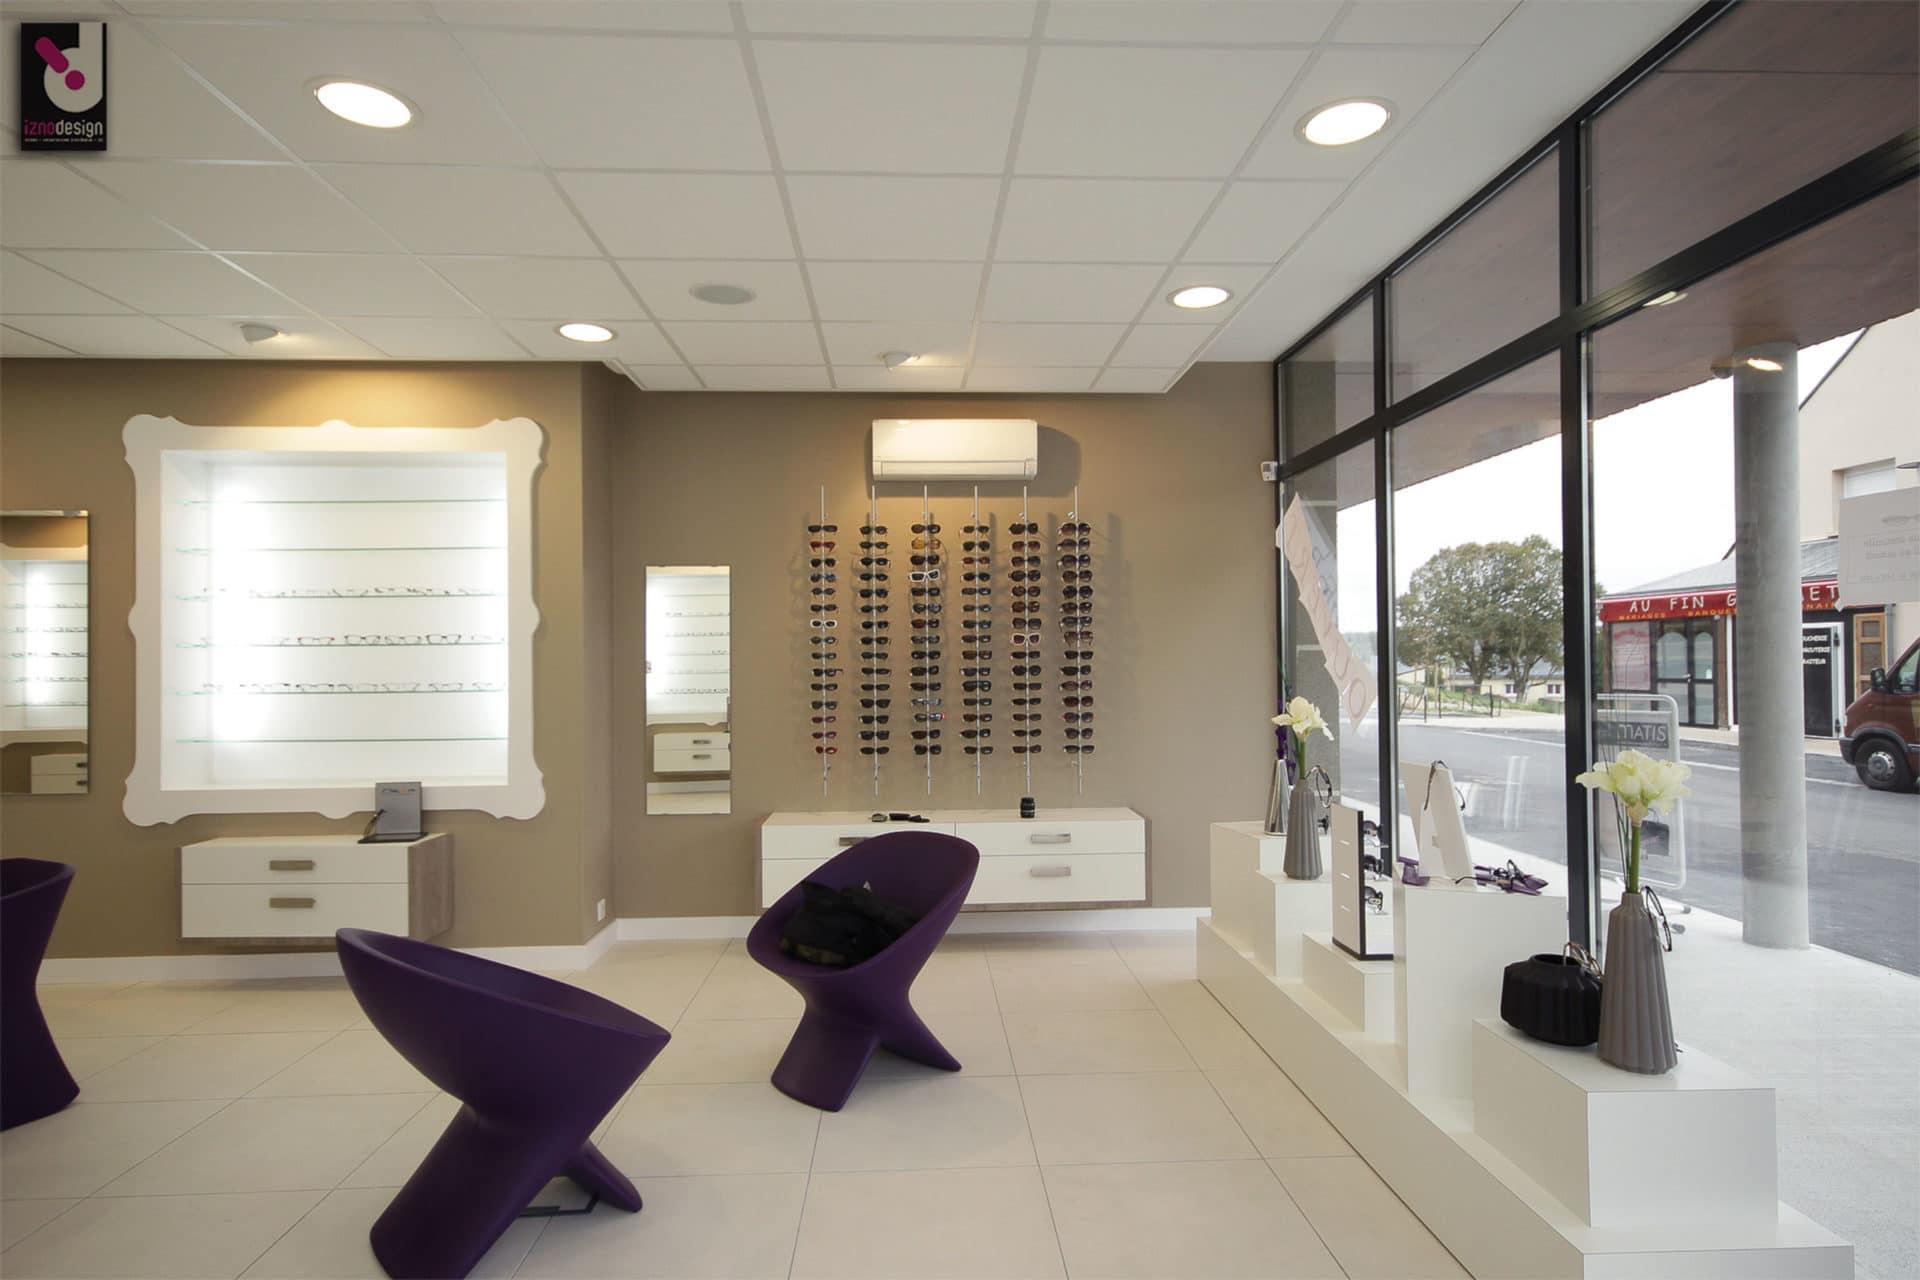 design architecte d 39 int rieur 3d rennes. Black Bedroom Furniture Sets. Home Design Ideas